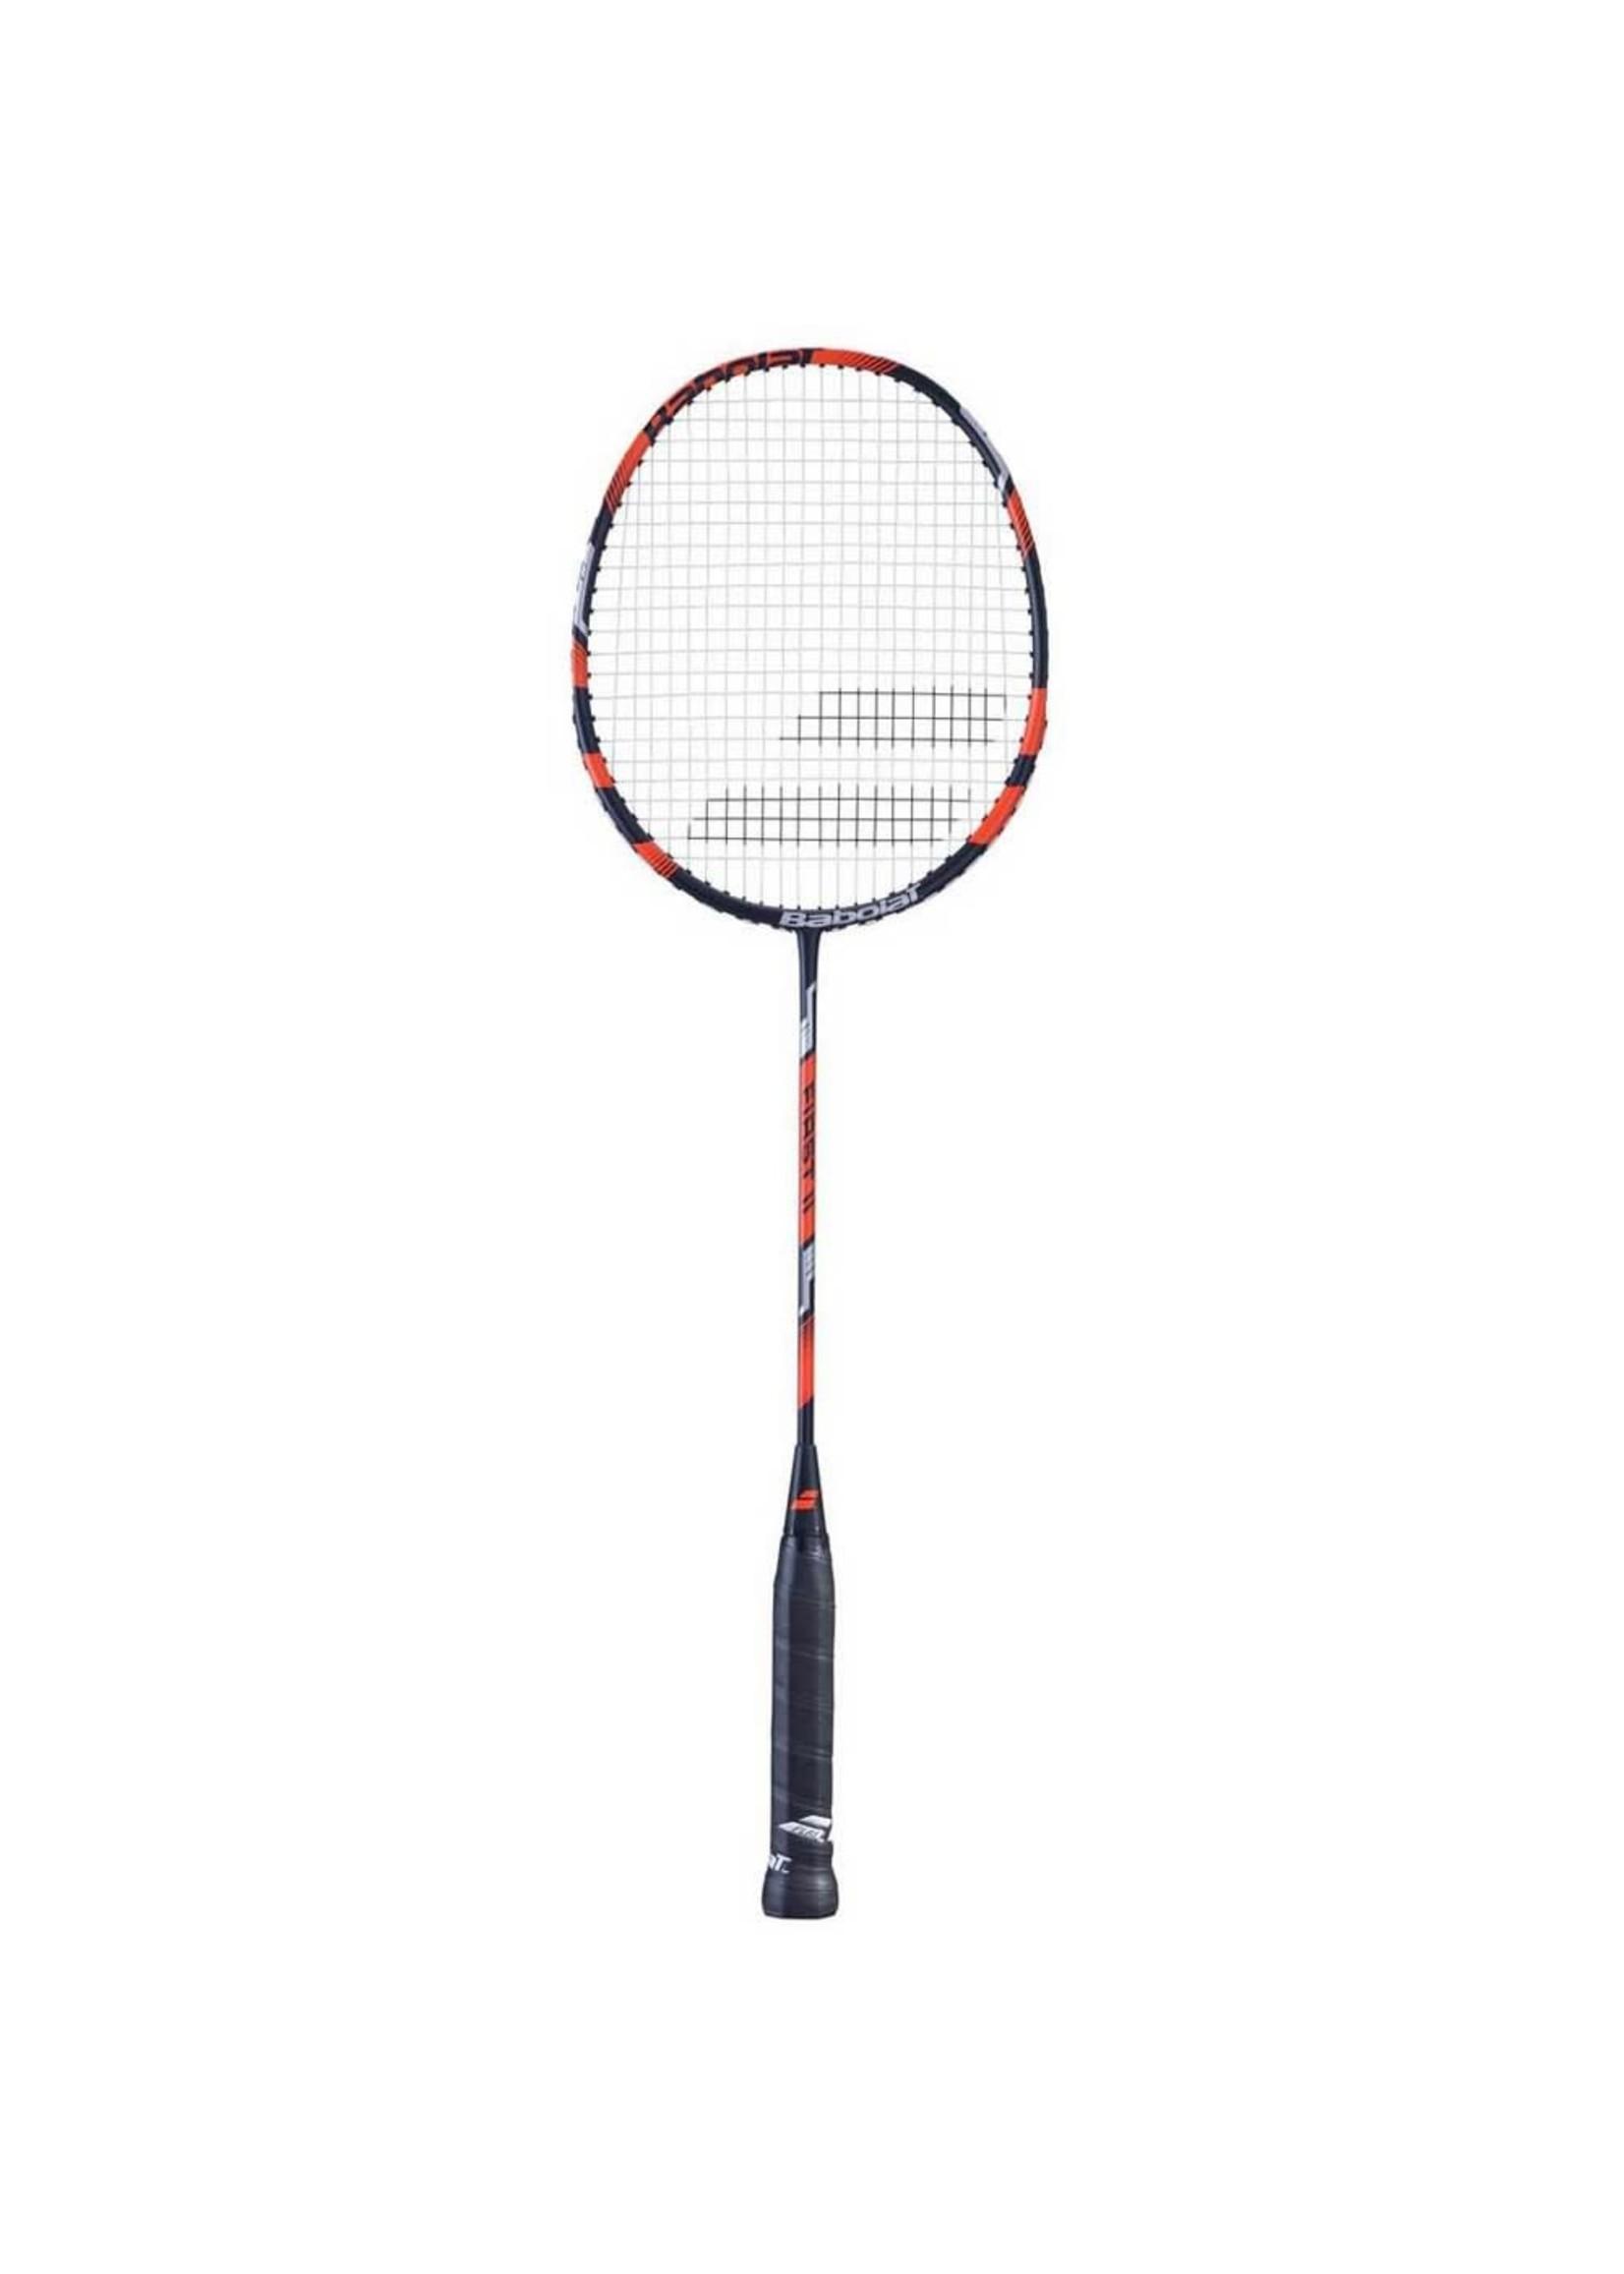 Babolat Babolat First II Badminton Racket, Red (2019)